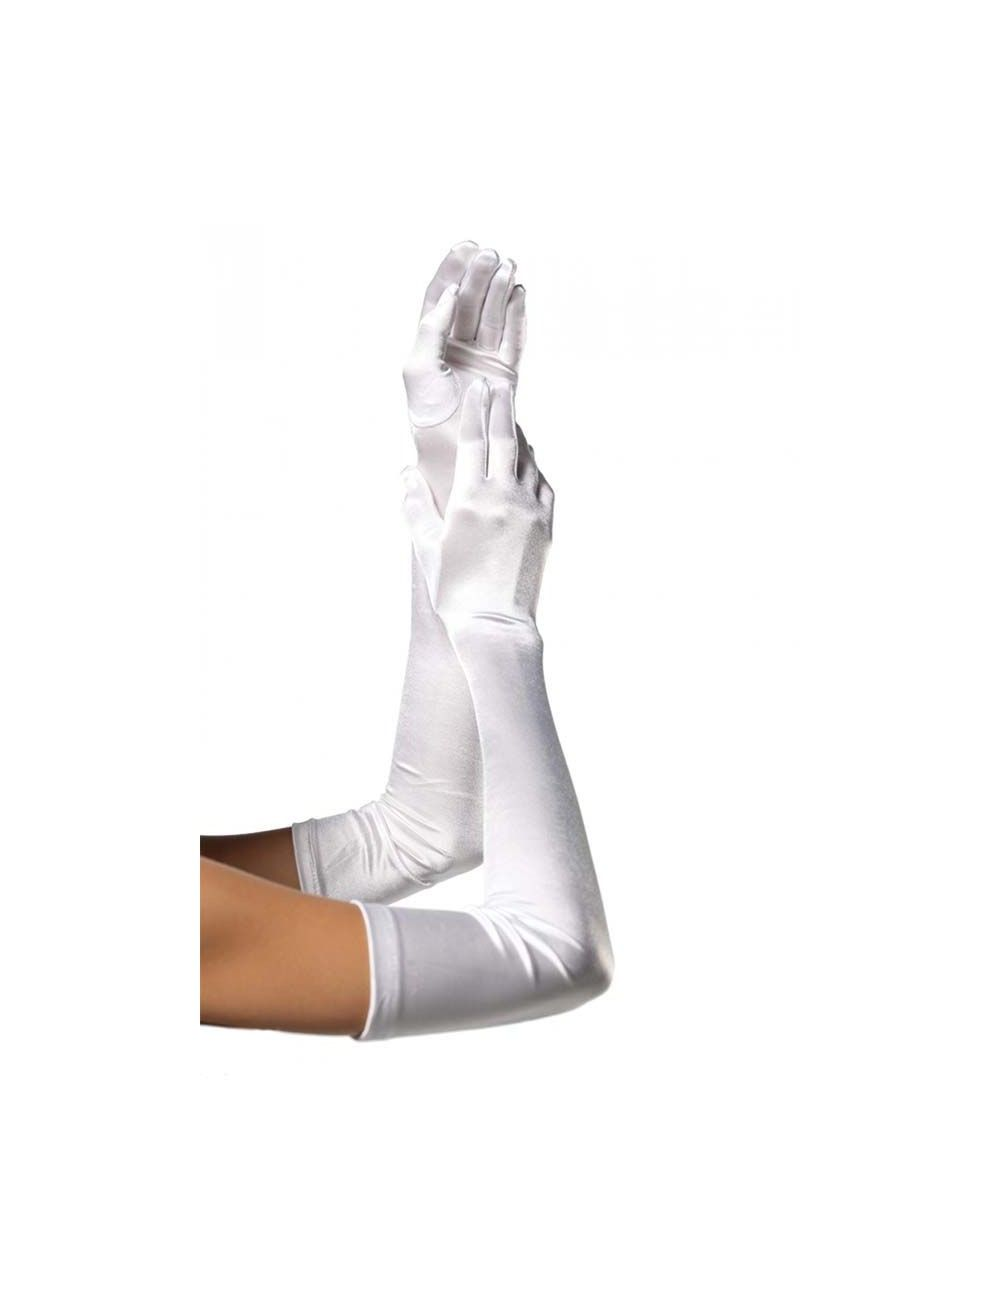 Gants blancs satinés et longs LEG AVENUE